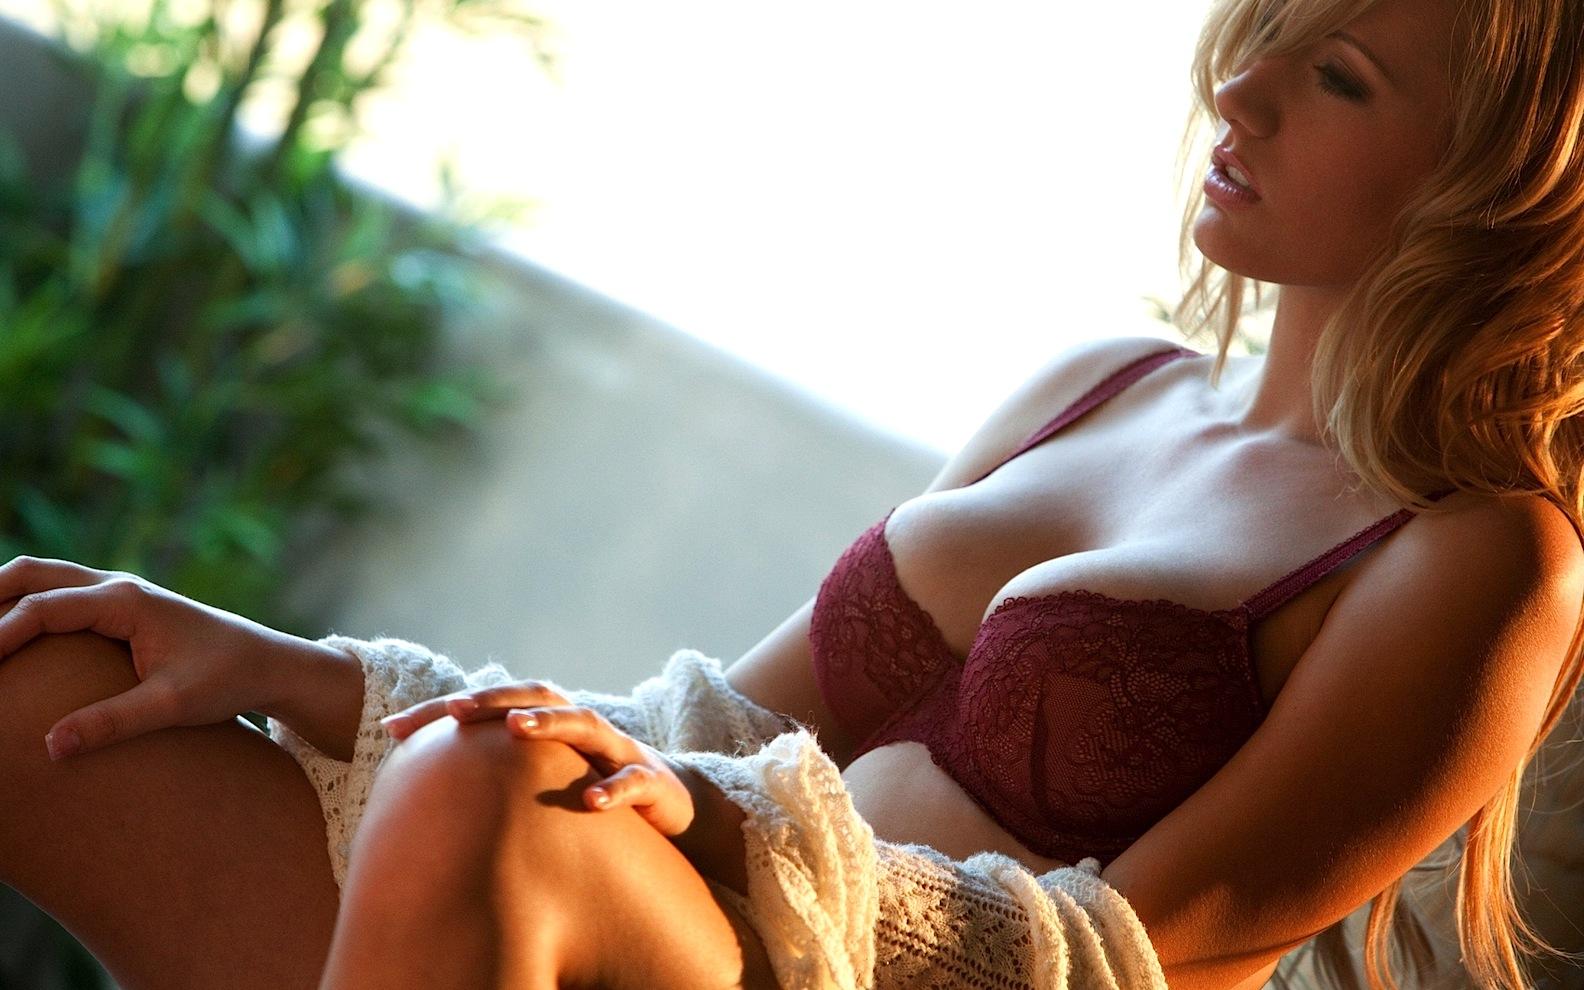 Boob girl hot image